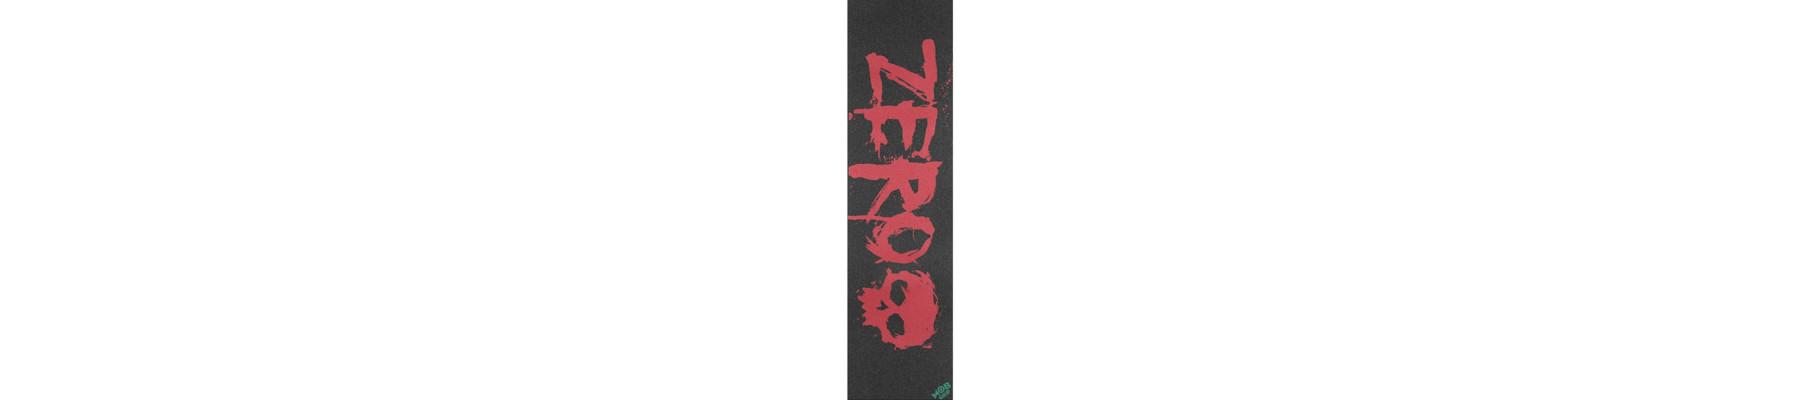 Zero Blood Skull MobGrip